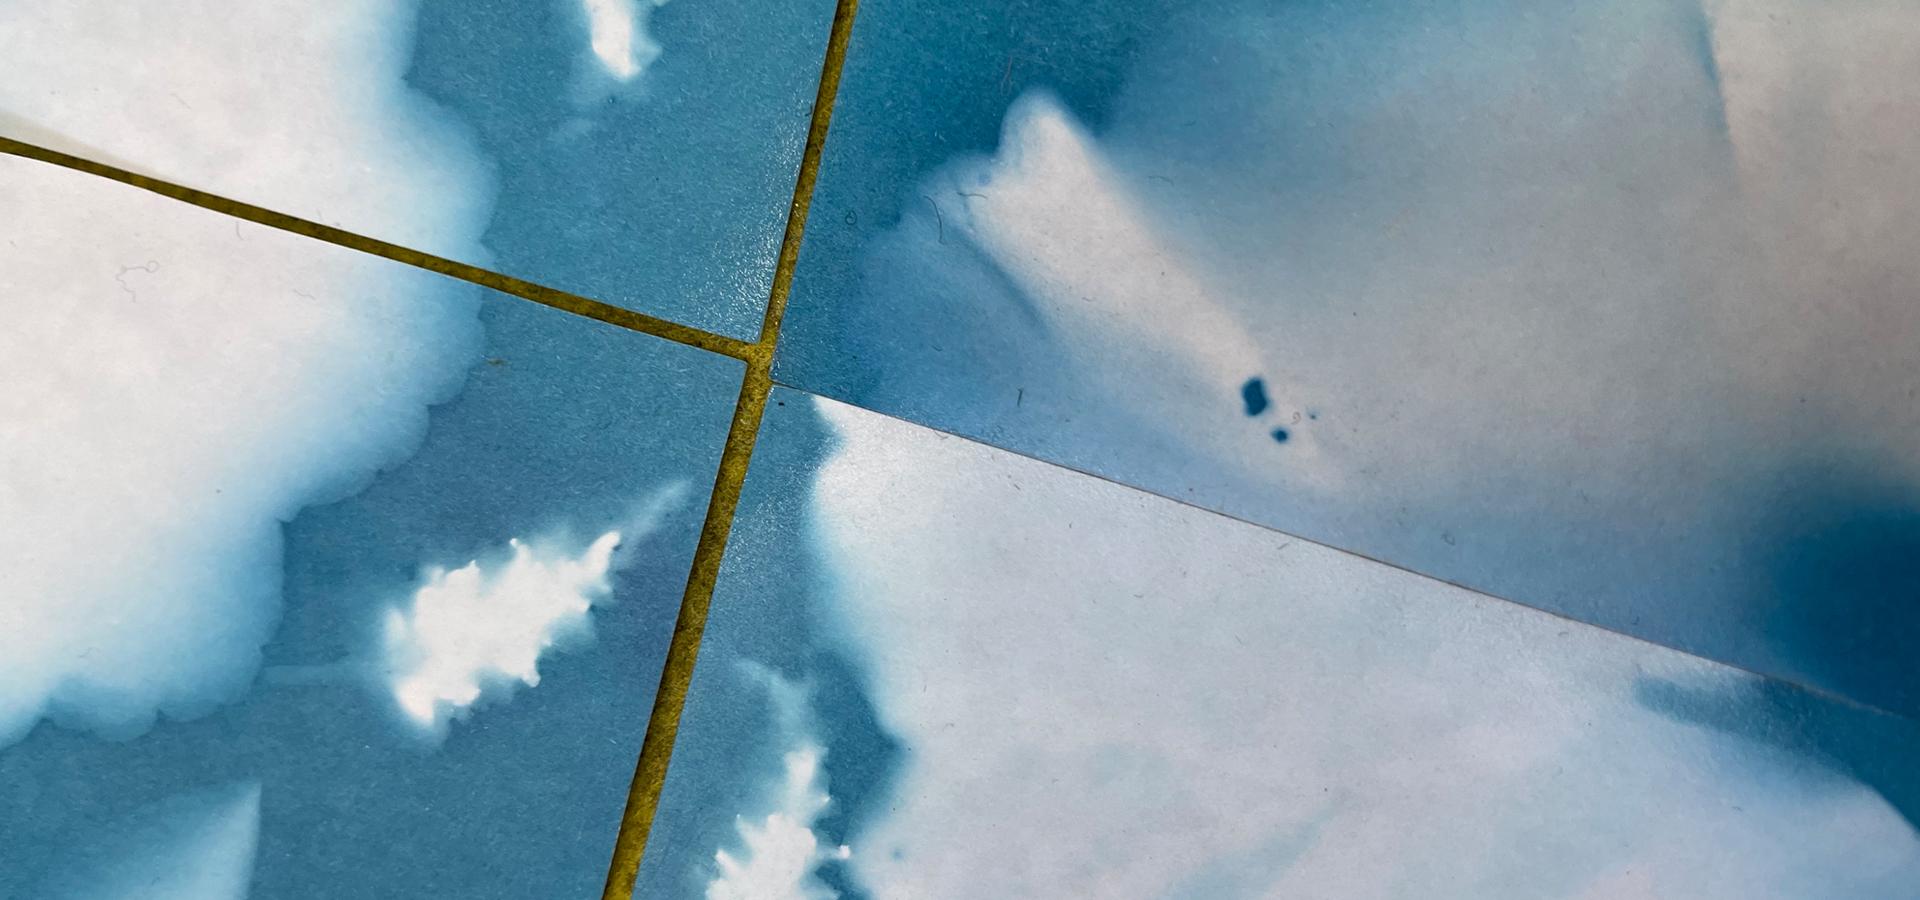 Blue cyanotype of leaf